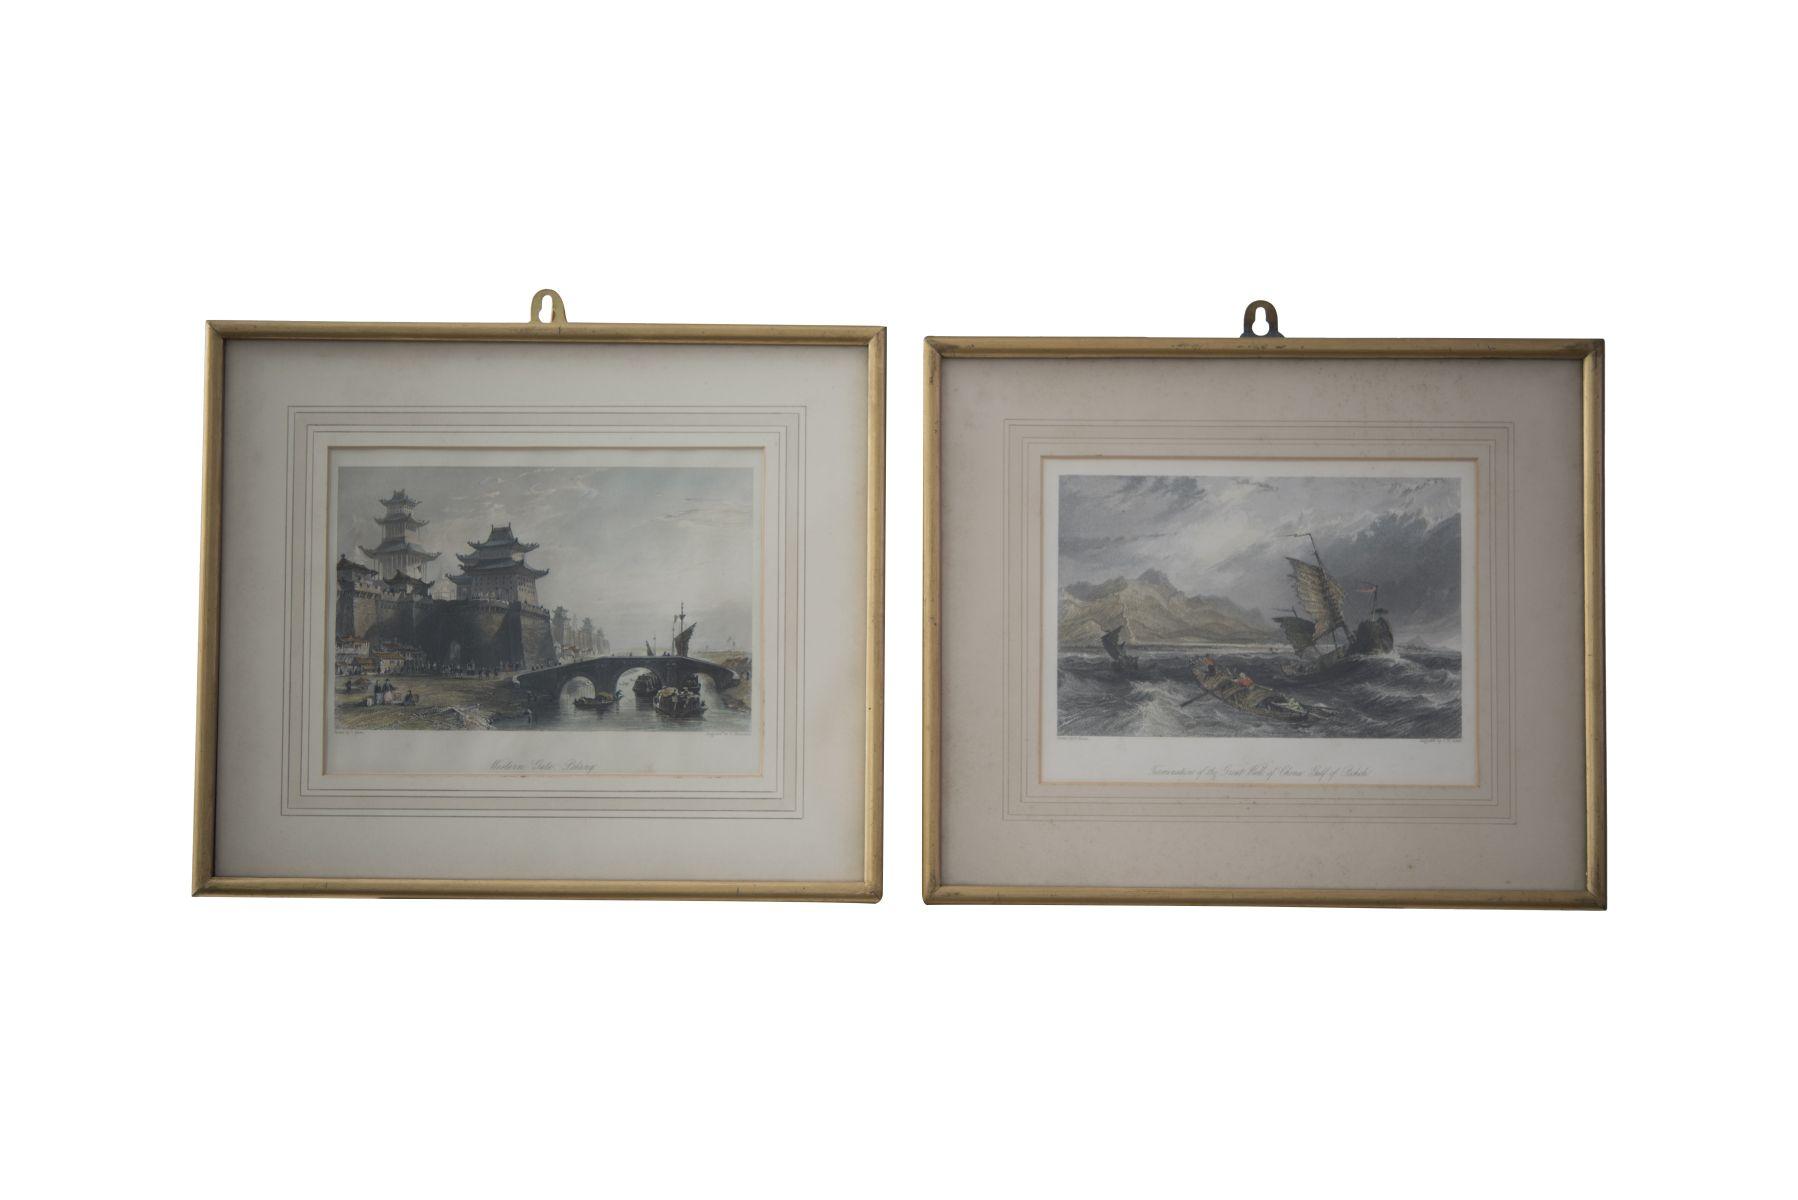 #88 2 copper engravings   2 Kupferstiche Image